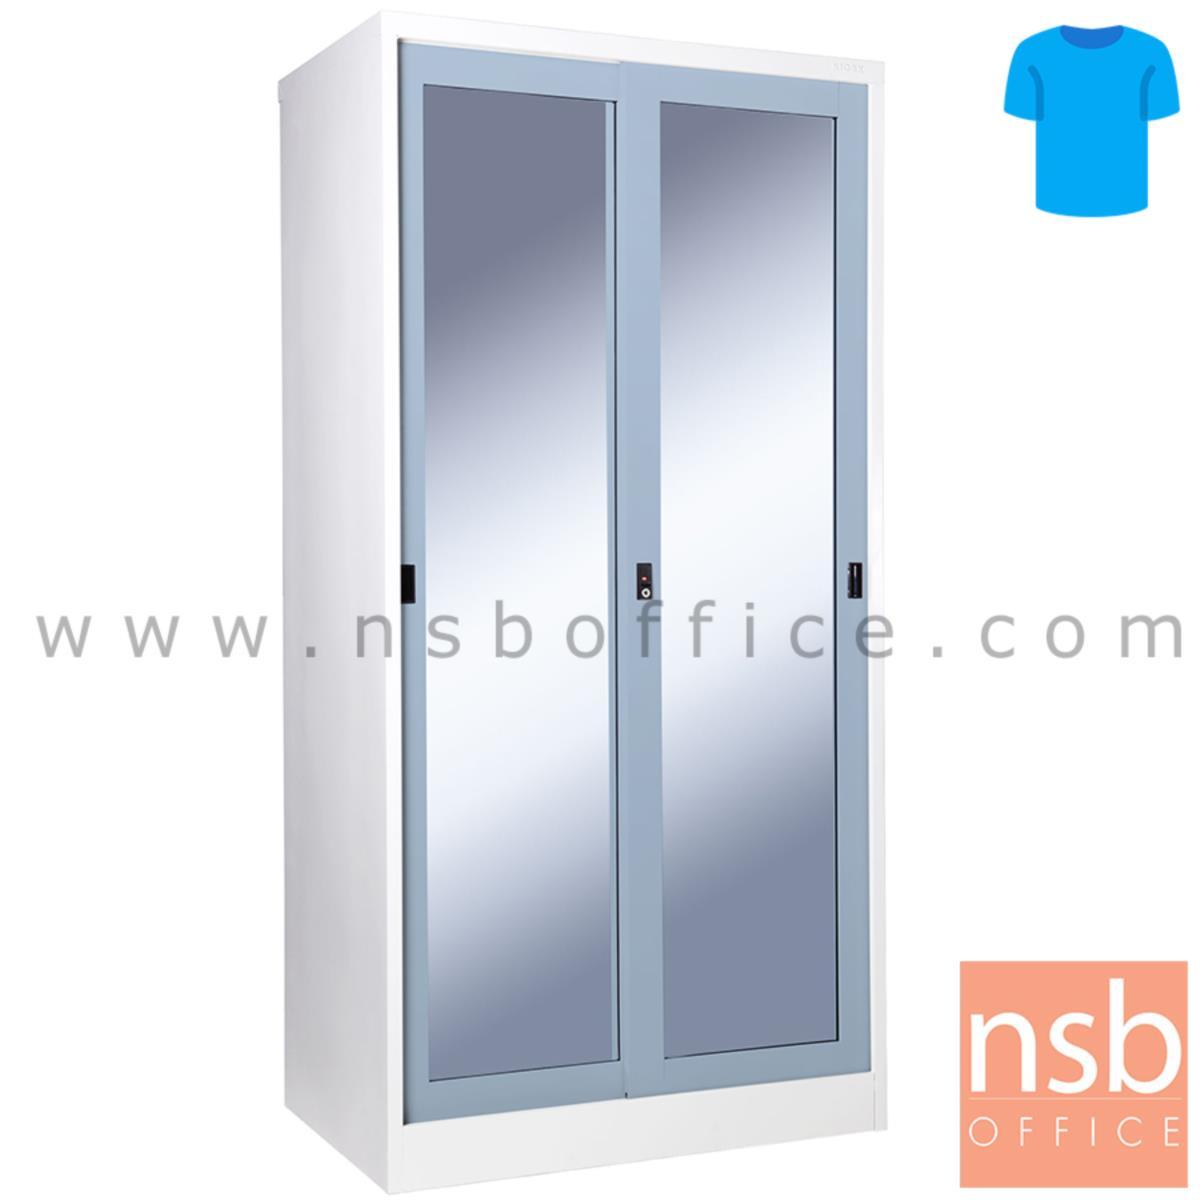 E23A002:ตู้เสื้อผ้าเหล็ก บานเลื่อนกระจกสูง 182H cm. รุ่น SGW-18 กุญล็อค